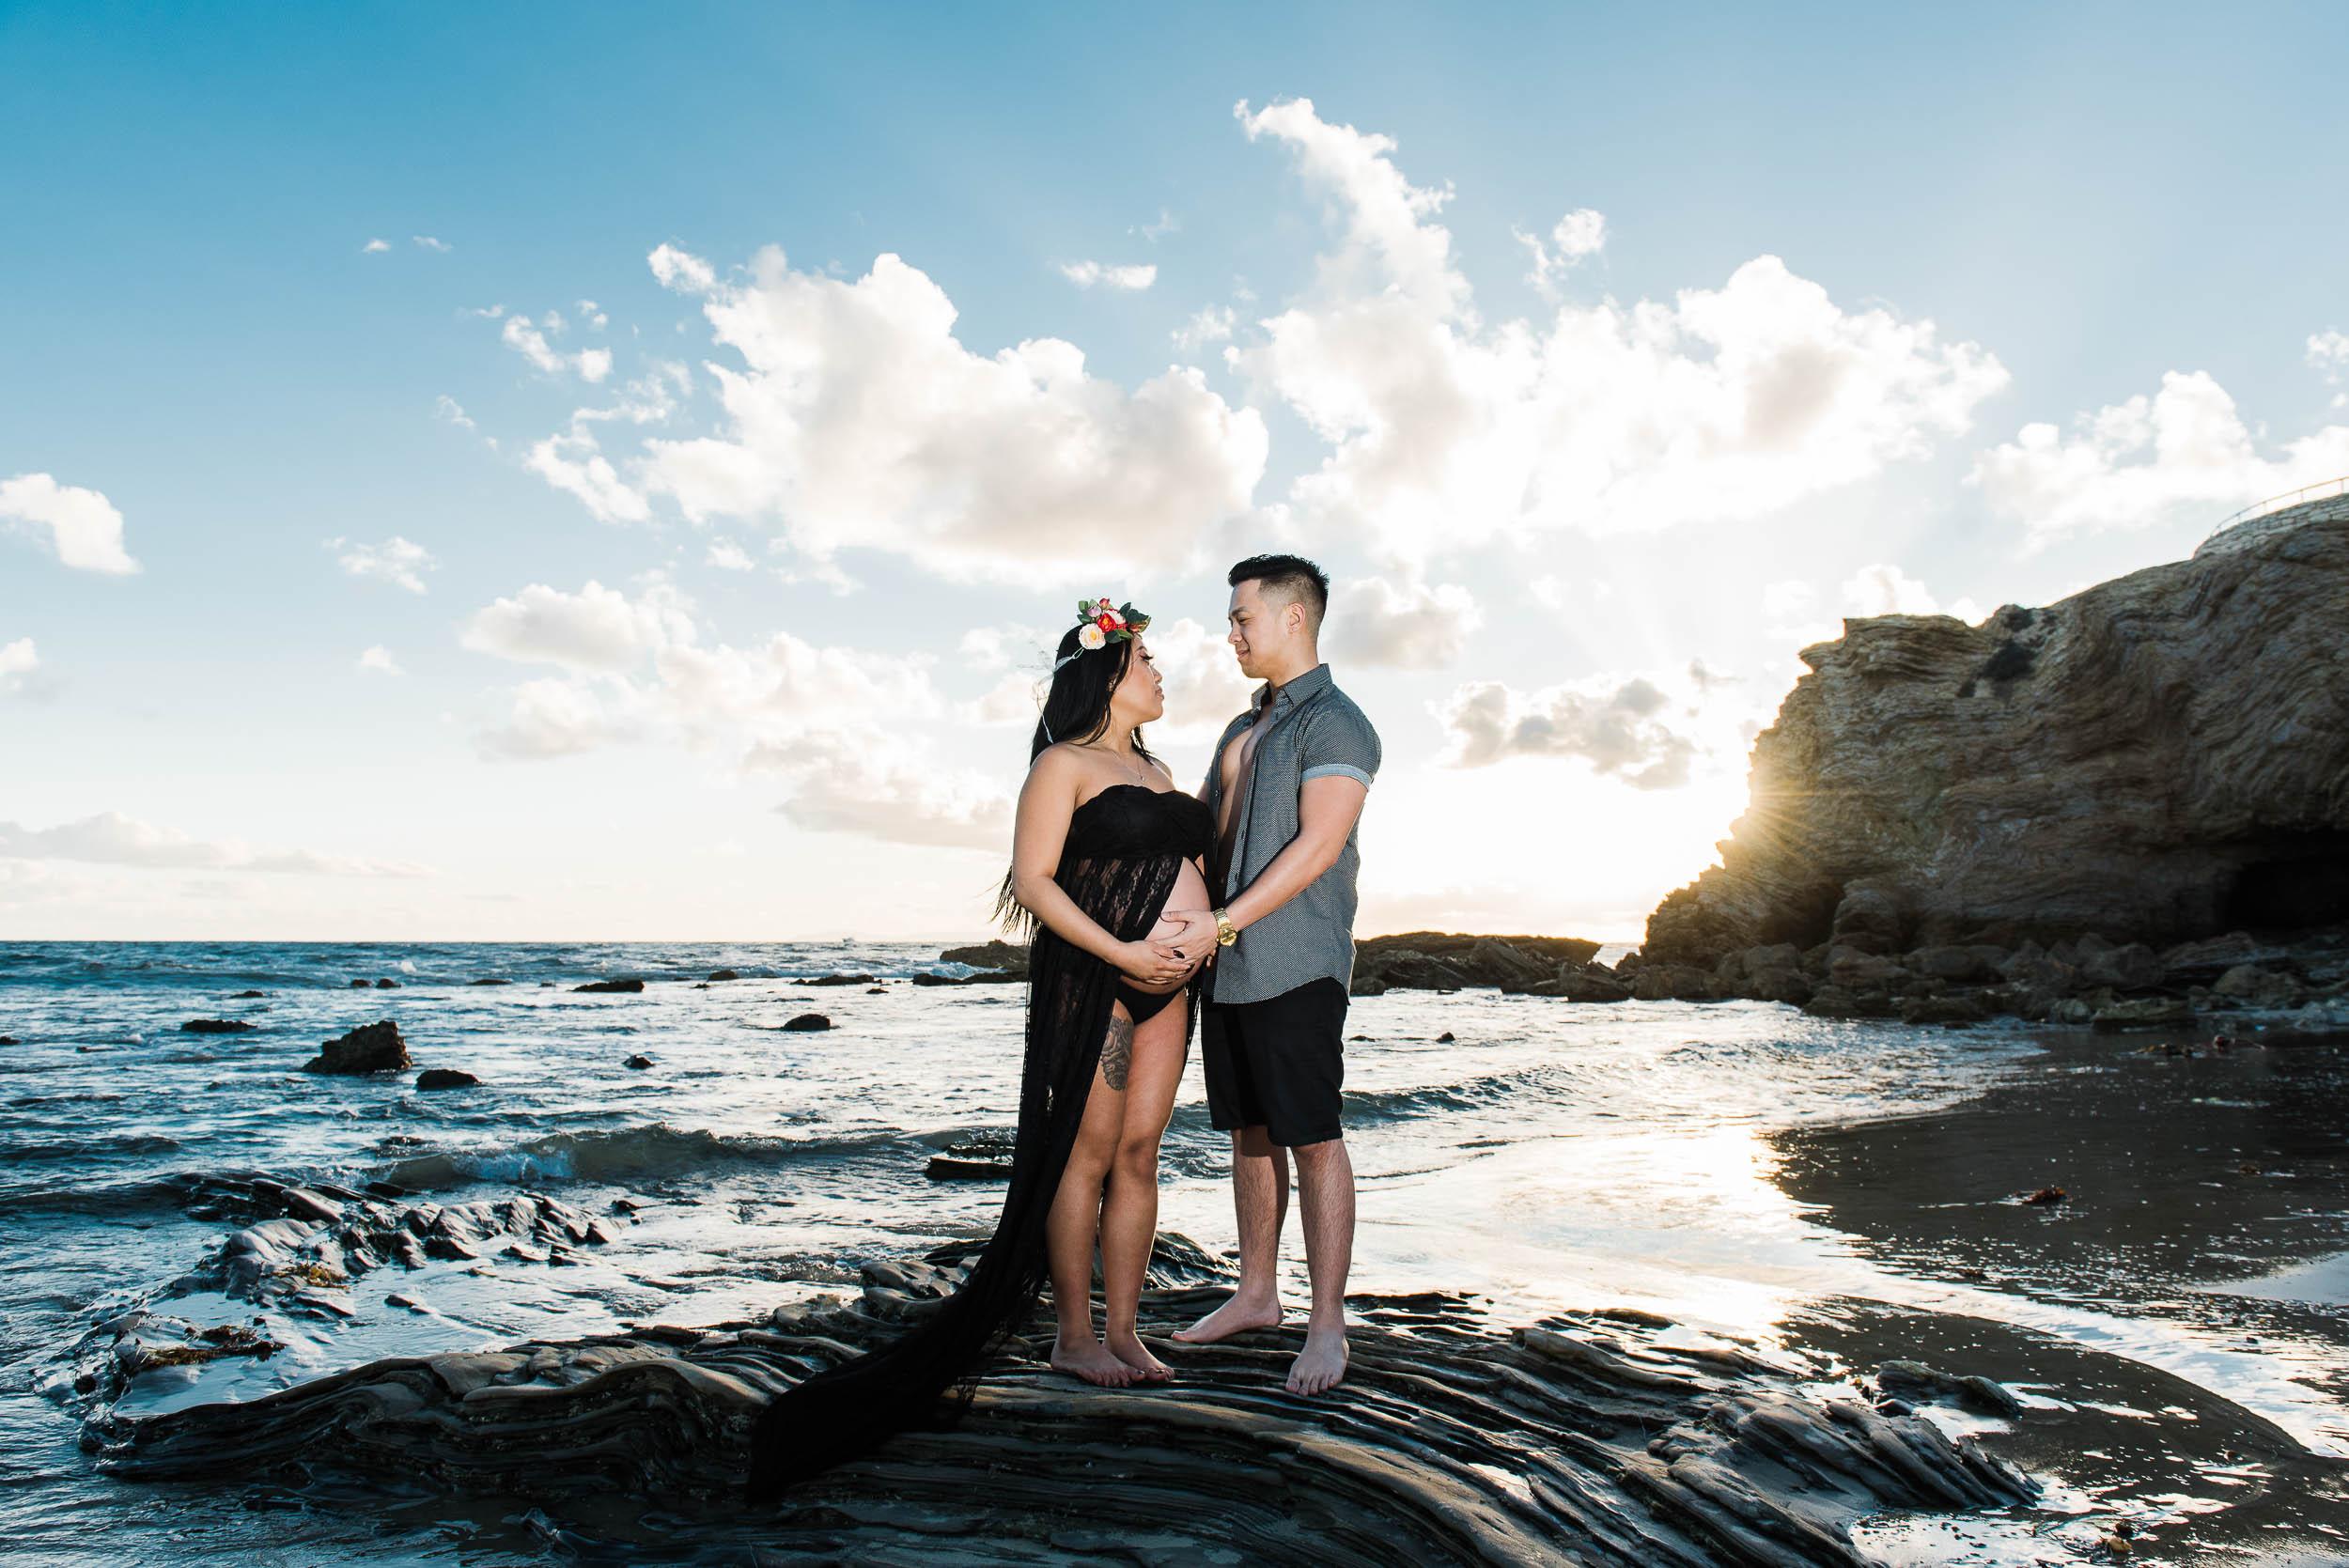 Miraflor-Photo-Peter-Crystal-Maternity-Photoshoot-Newport-Beach-20180317-073.jpg